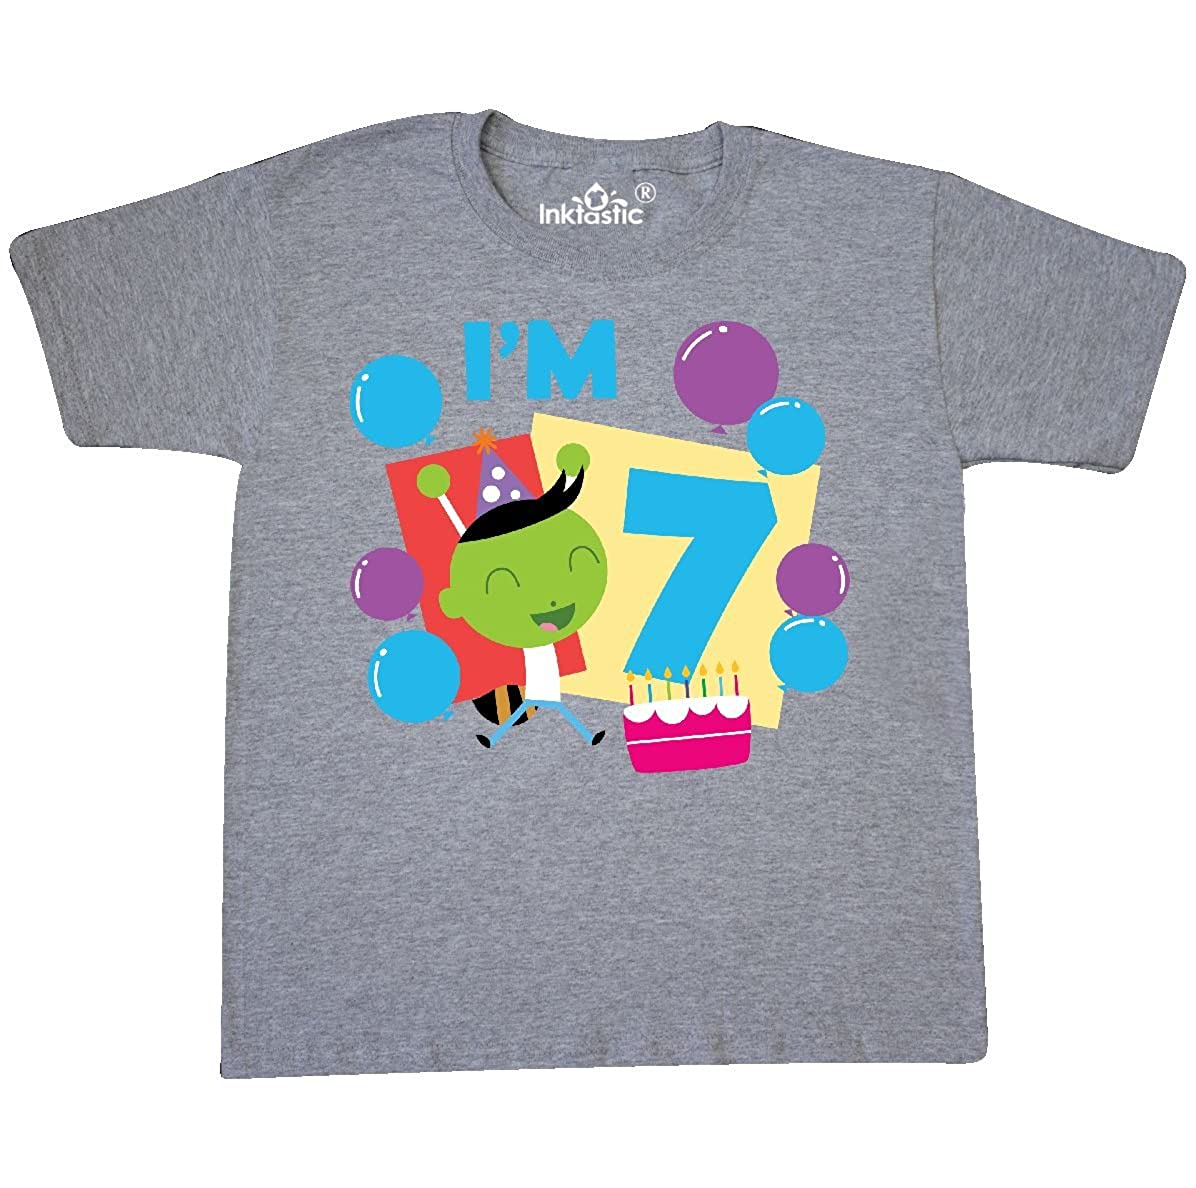 Luis Dubons LGOODS Classic T-Shirt Purple 2XL